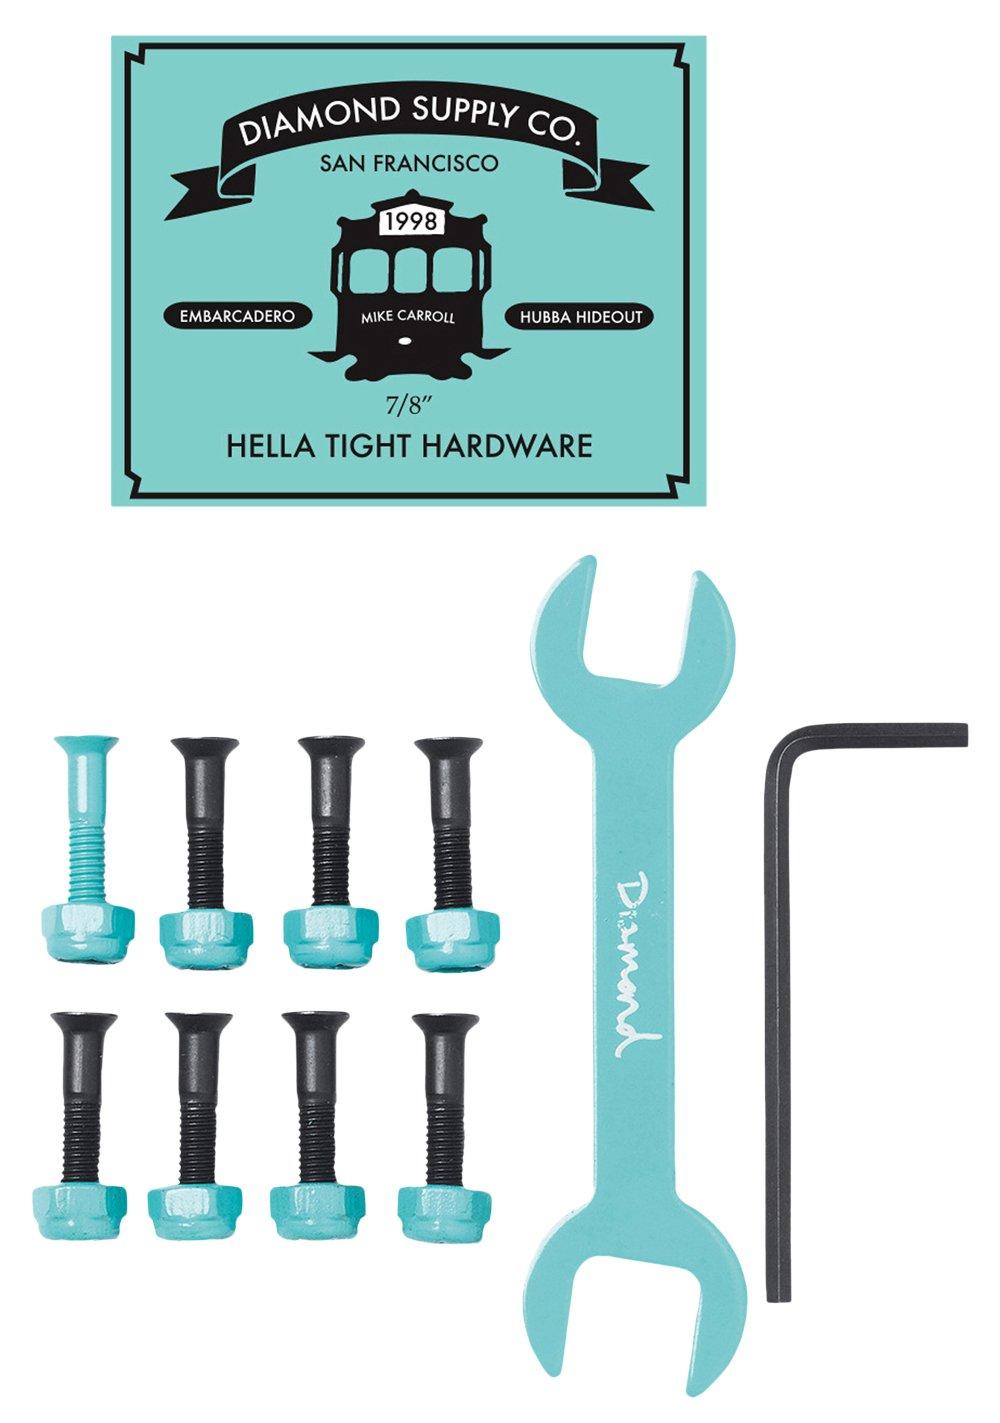 Viti Diamond: Hella Tight Hardware Mike Carroll 7/8